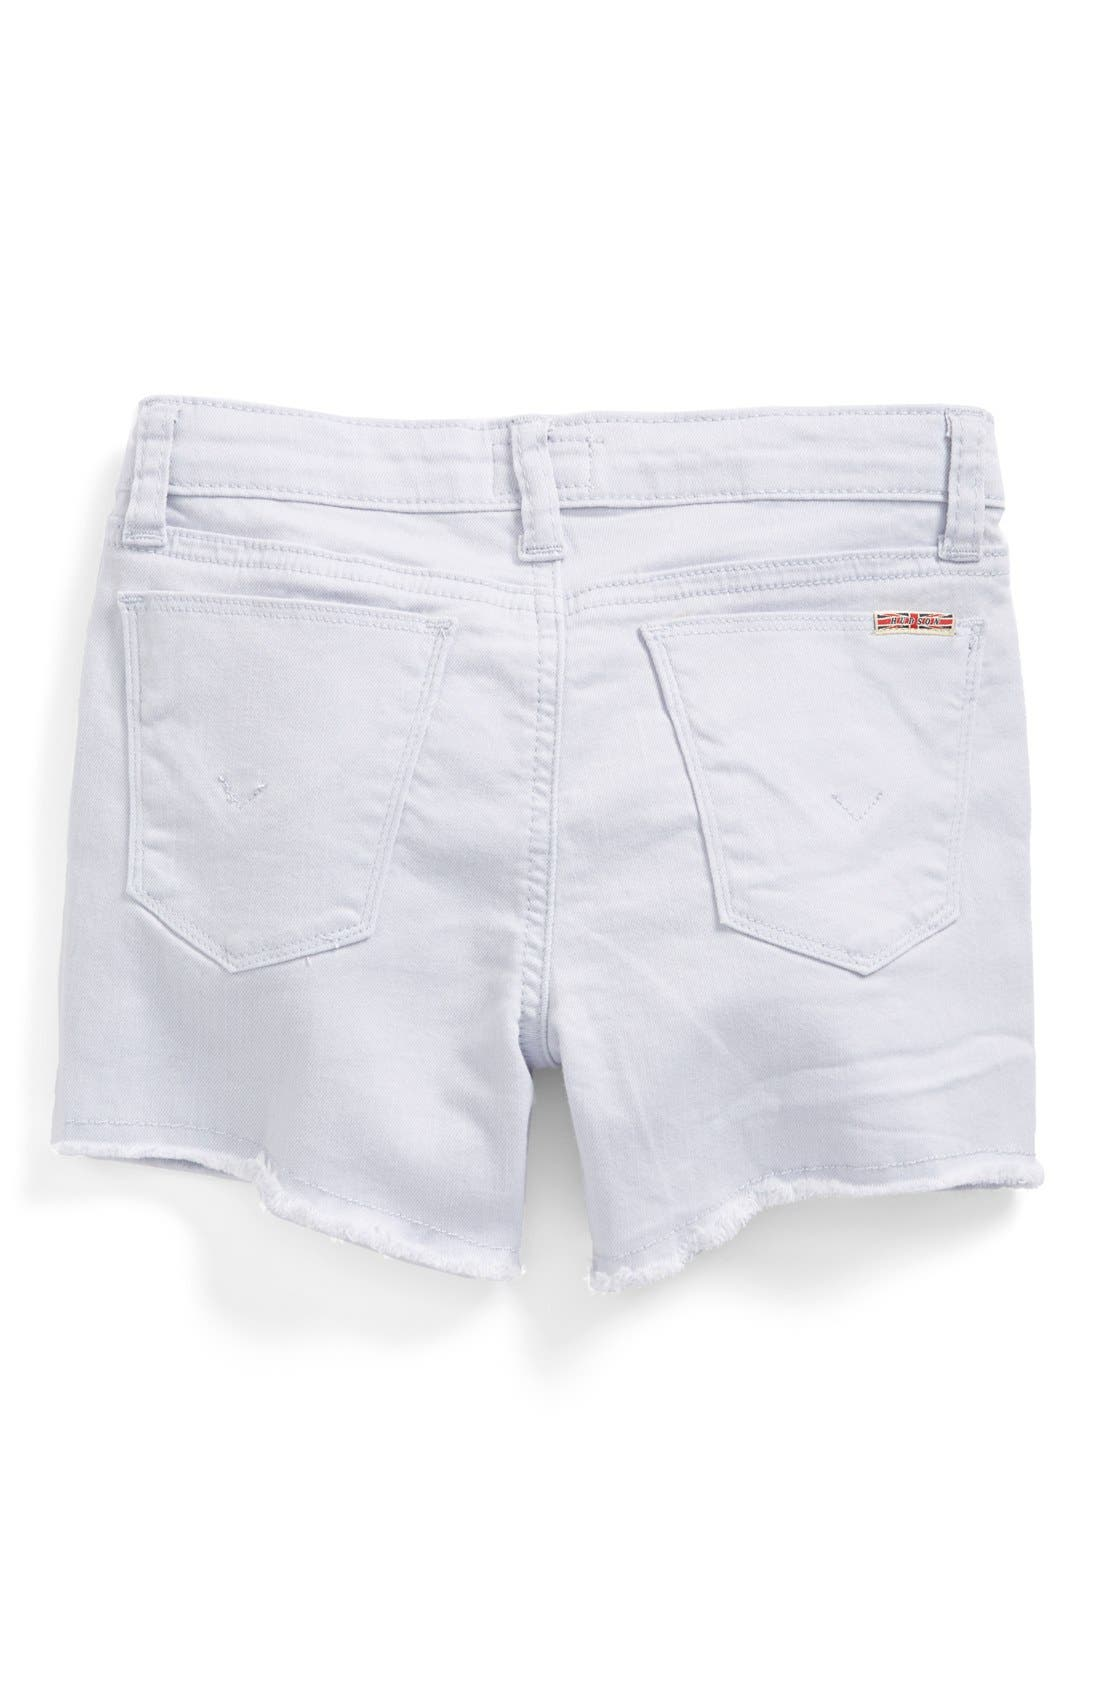 Alternate Image 1 Selected - Hudson Kids Raw Edge Jean Shorts (Big Girls)